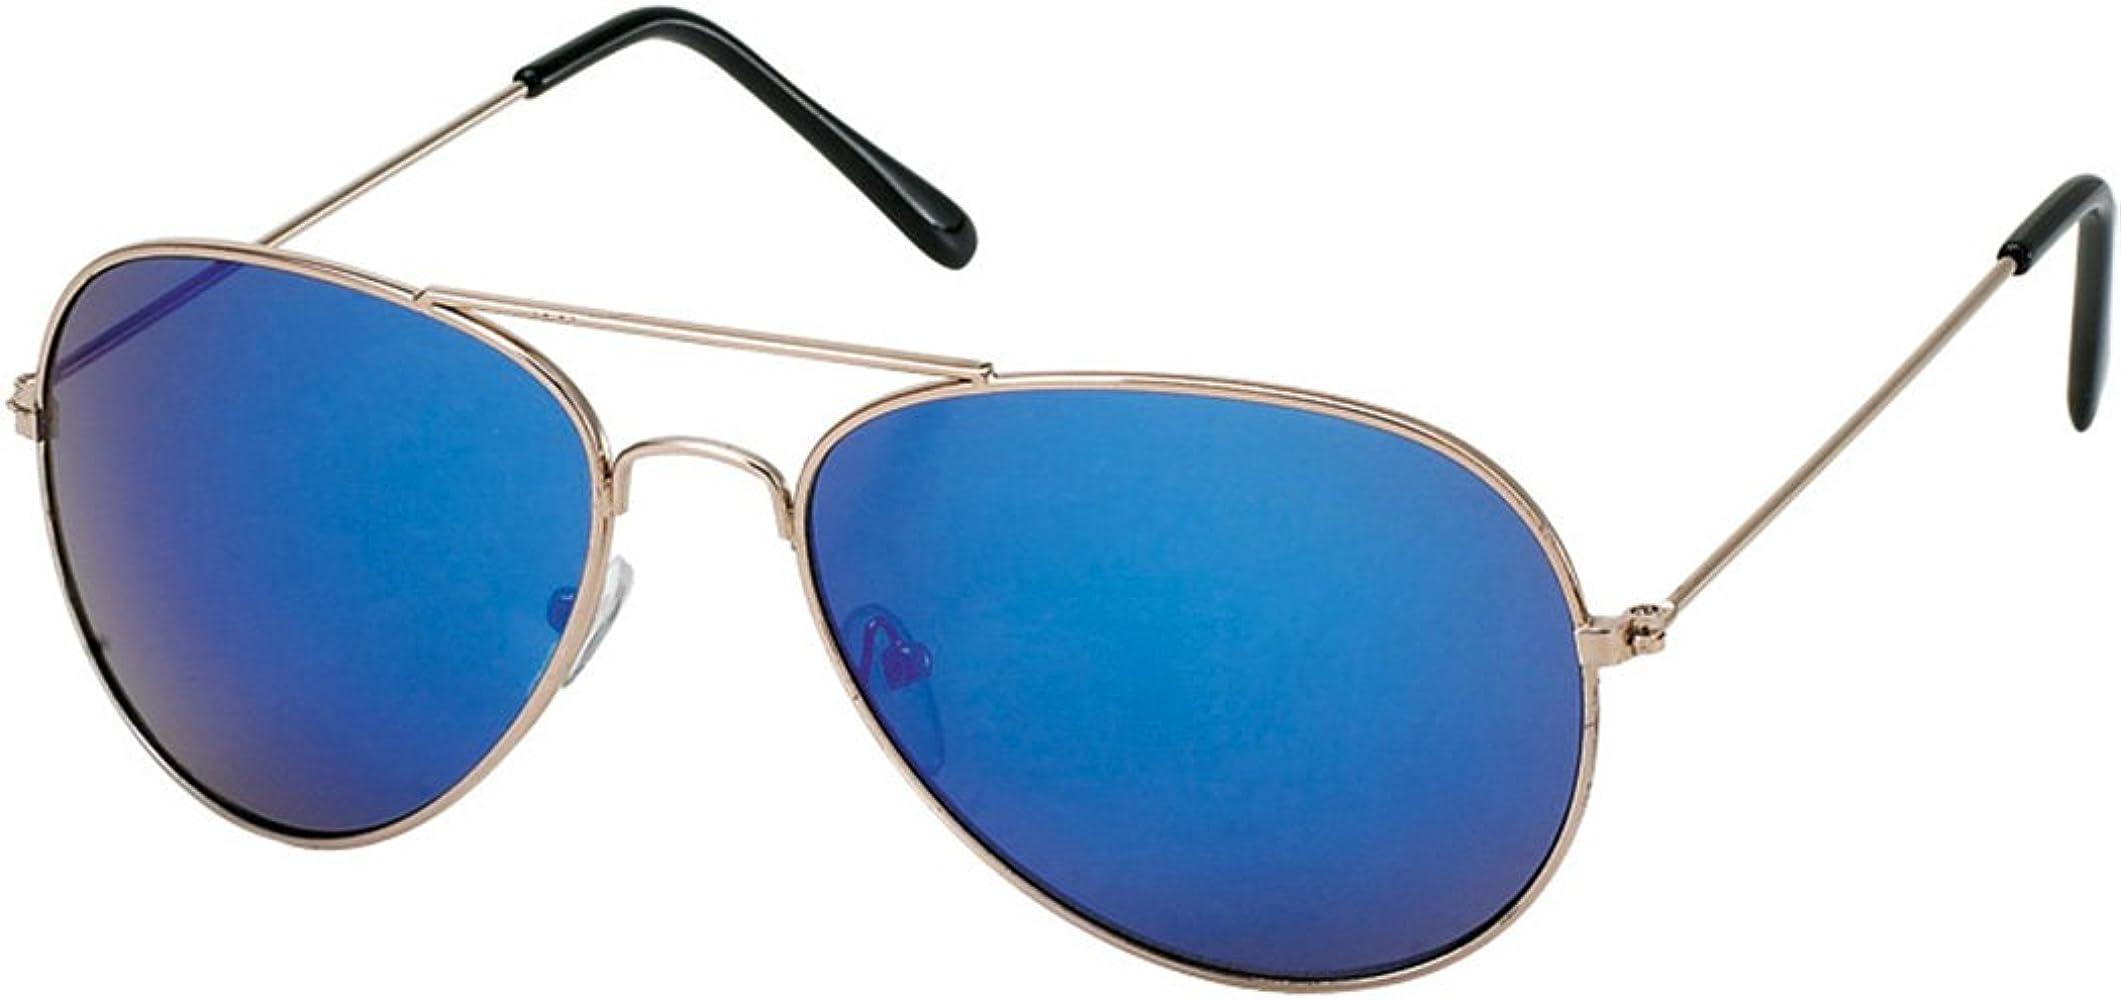 All Cheap Sunglasses - Phoenix - Ice Blue - Gafas de Sol ...